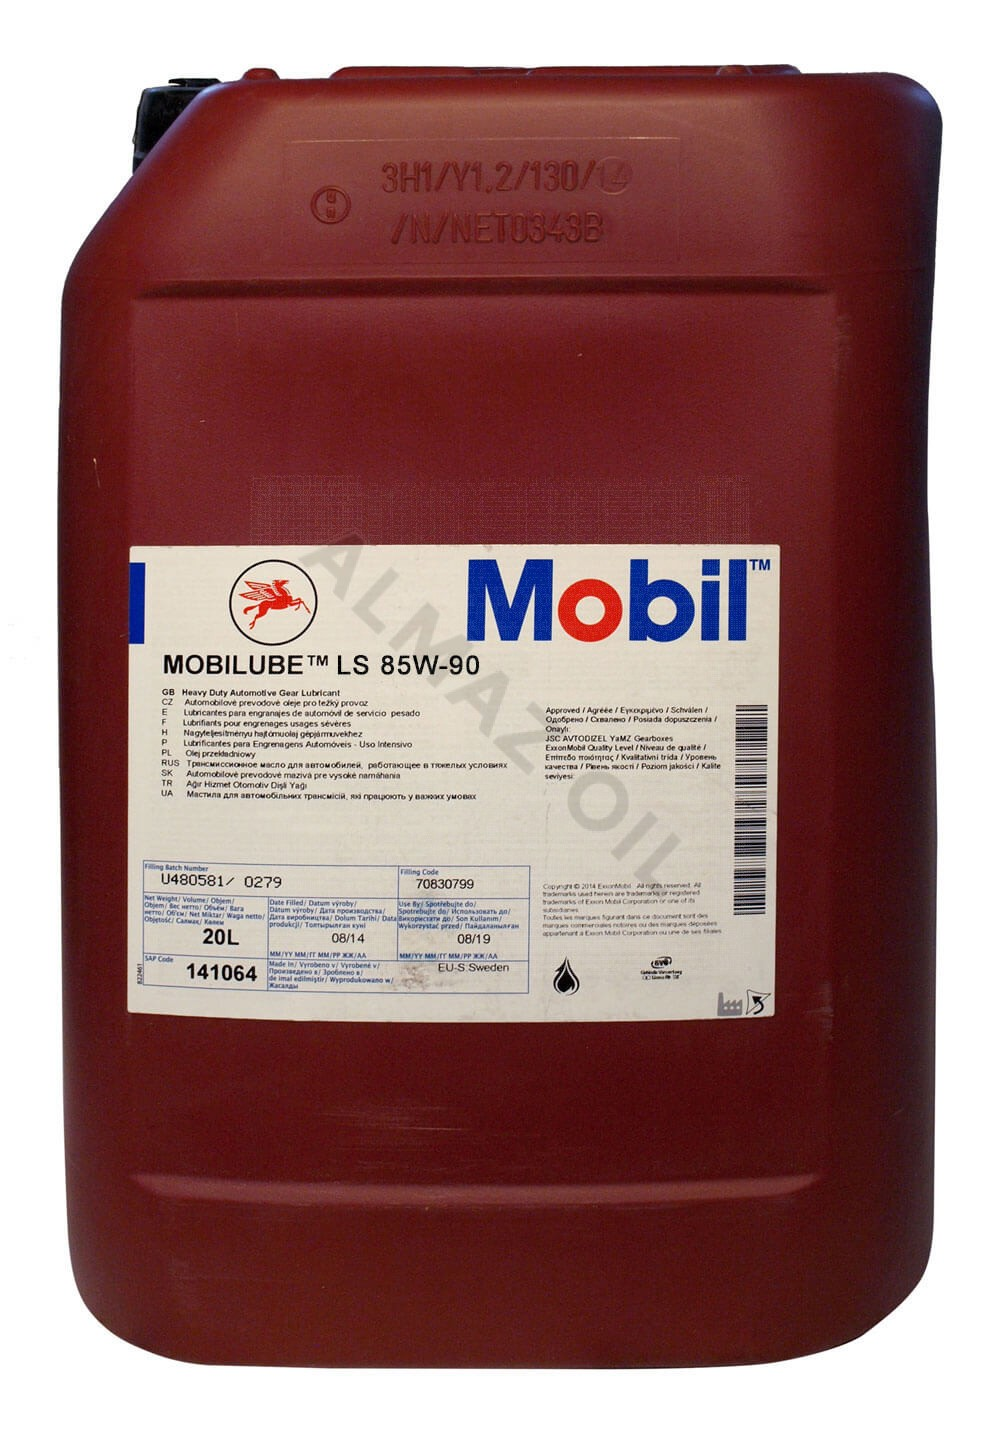 Mobilube LS 85W-90